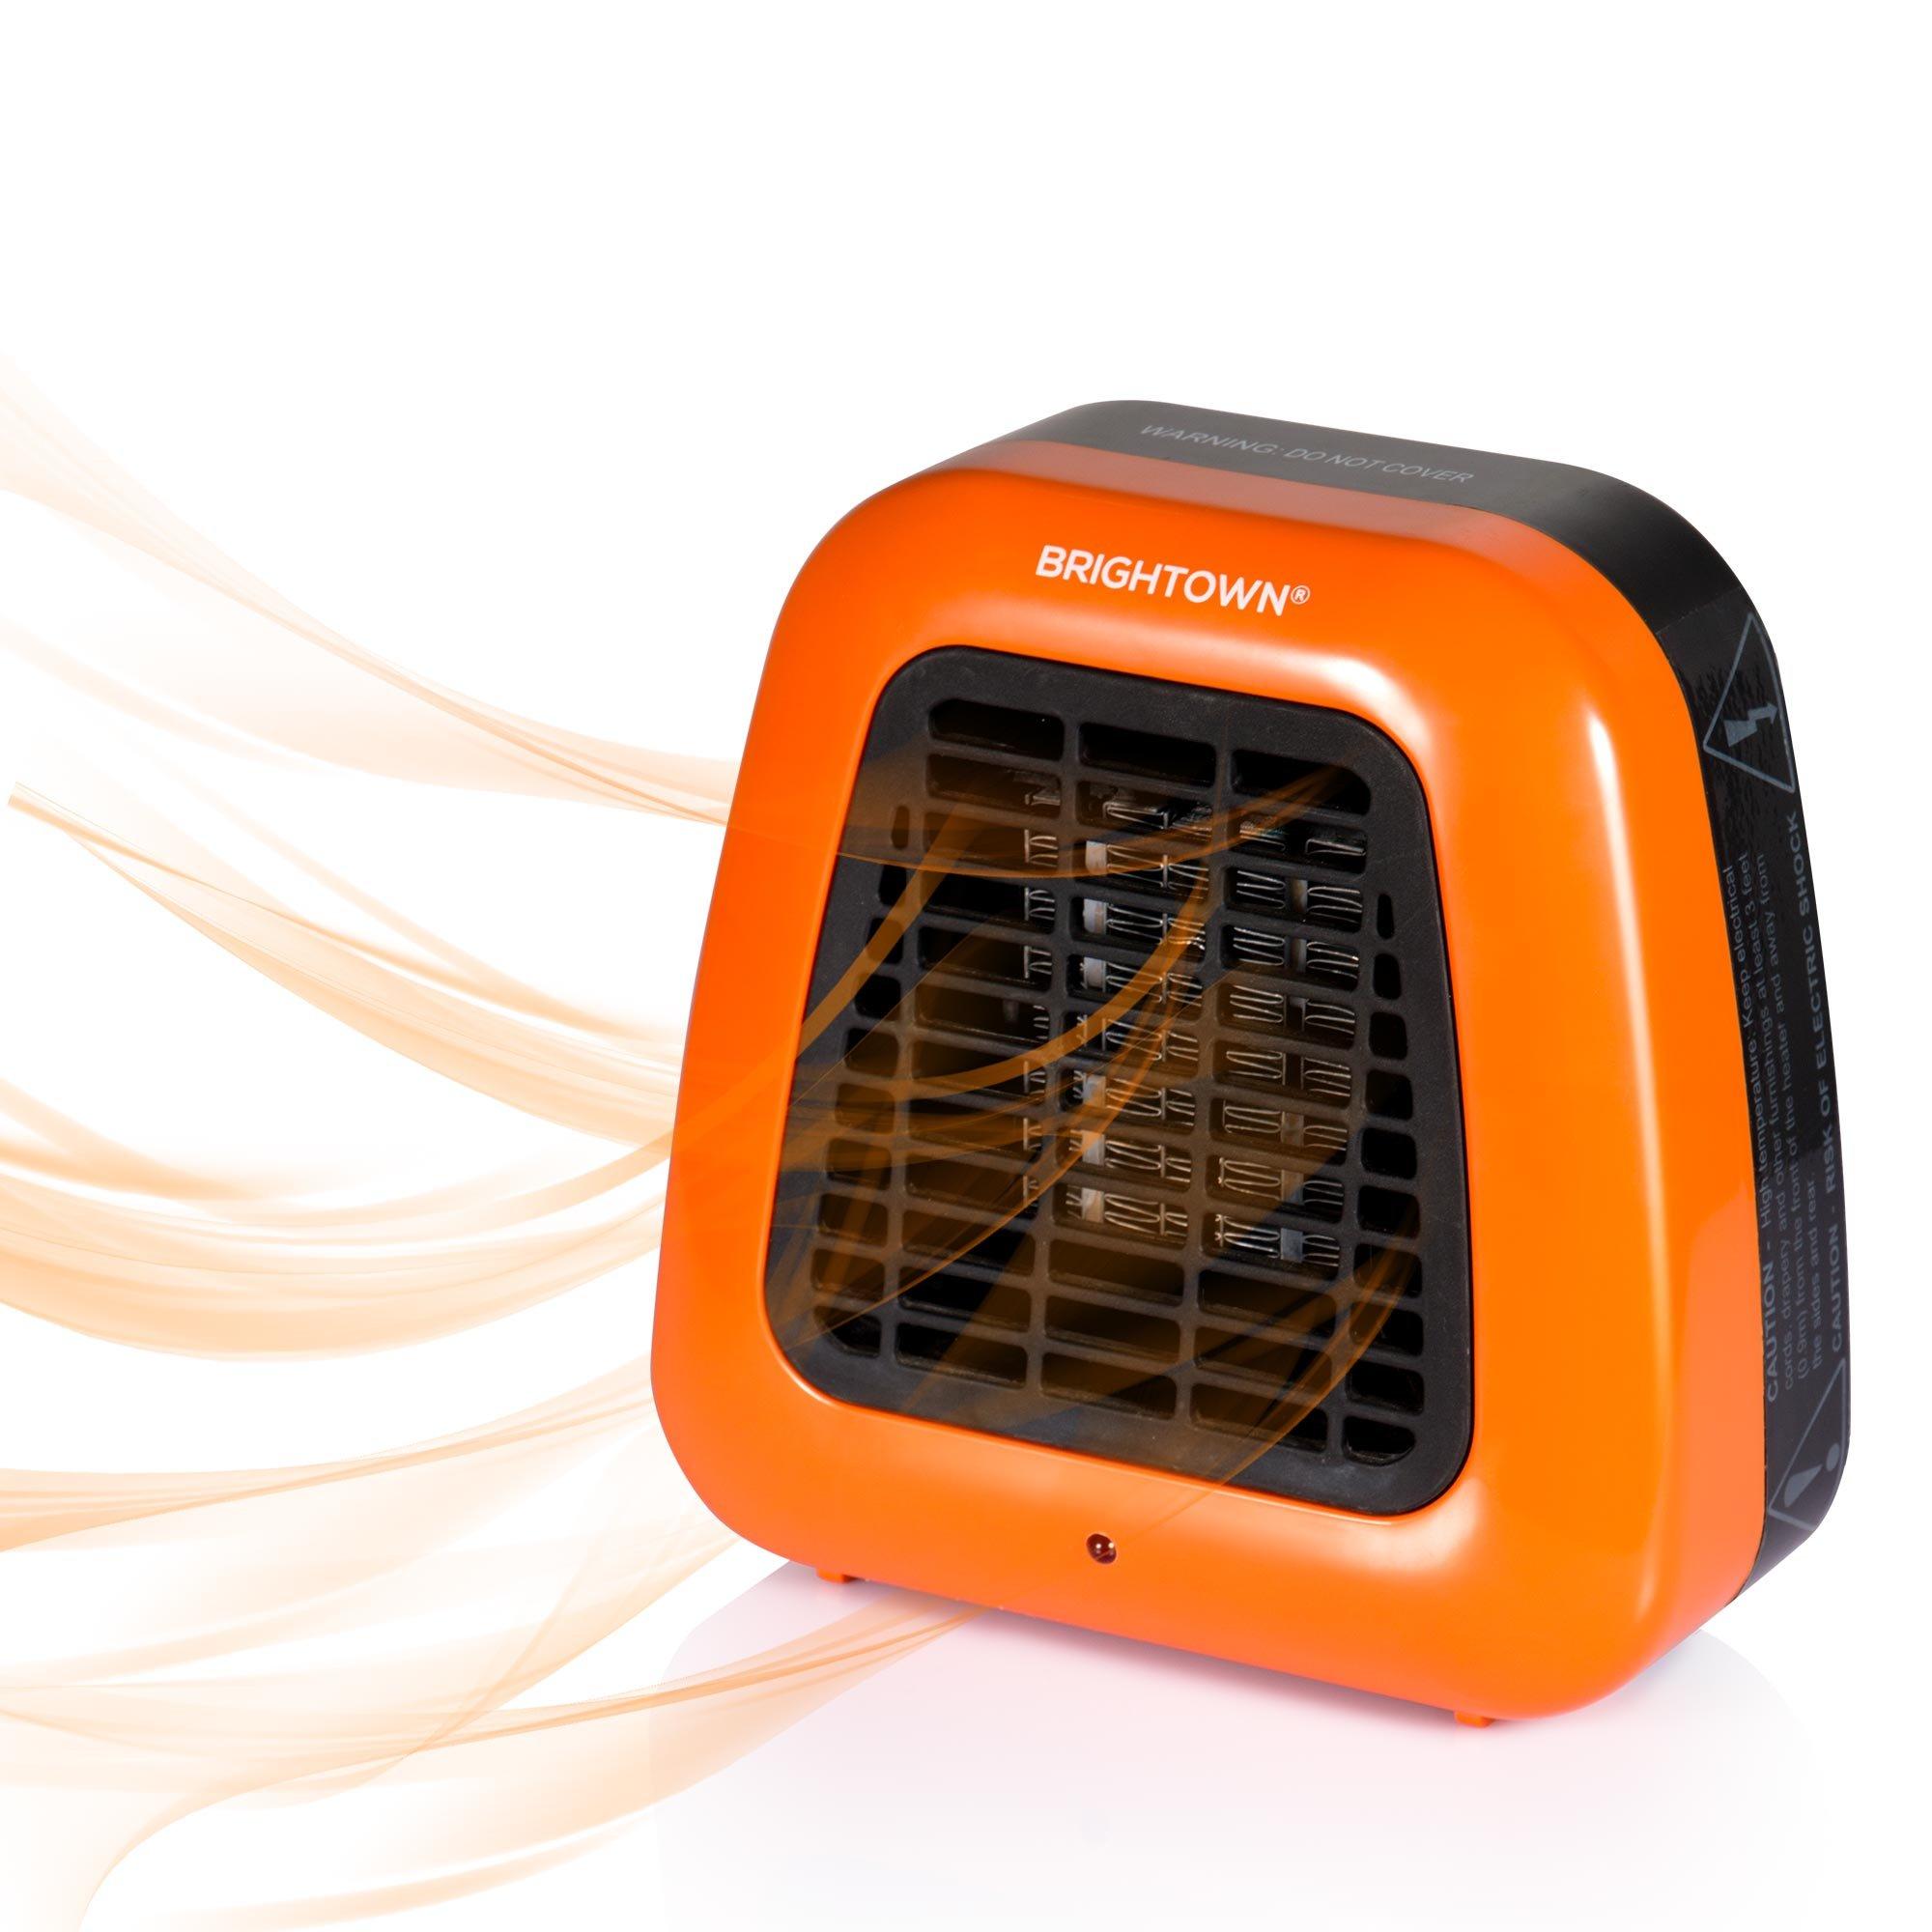 Personal Ceramic Portable-Mini Heater for Office Desktop Table Home Dorm, 400-Watt ETL Listed for Safe Use, Orange by Brightown (Image #3)